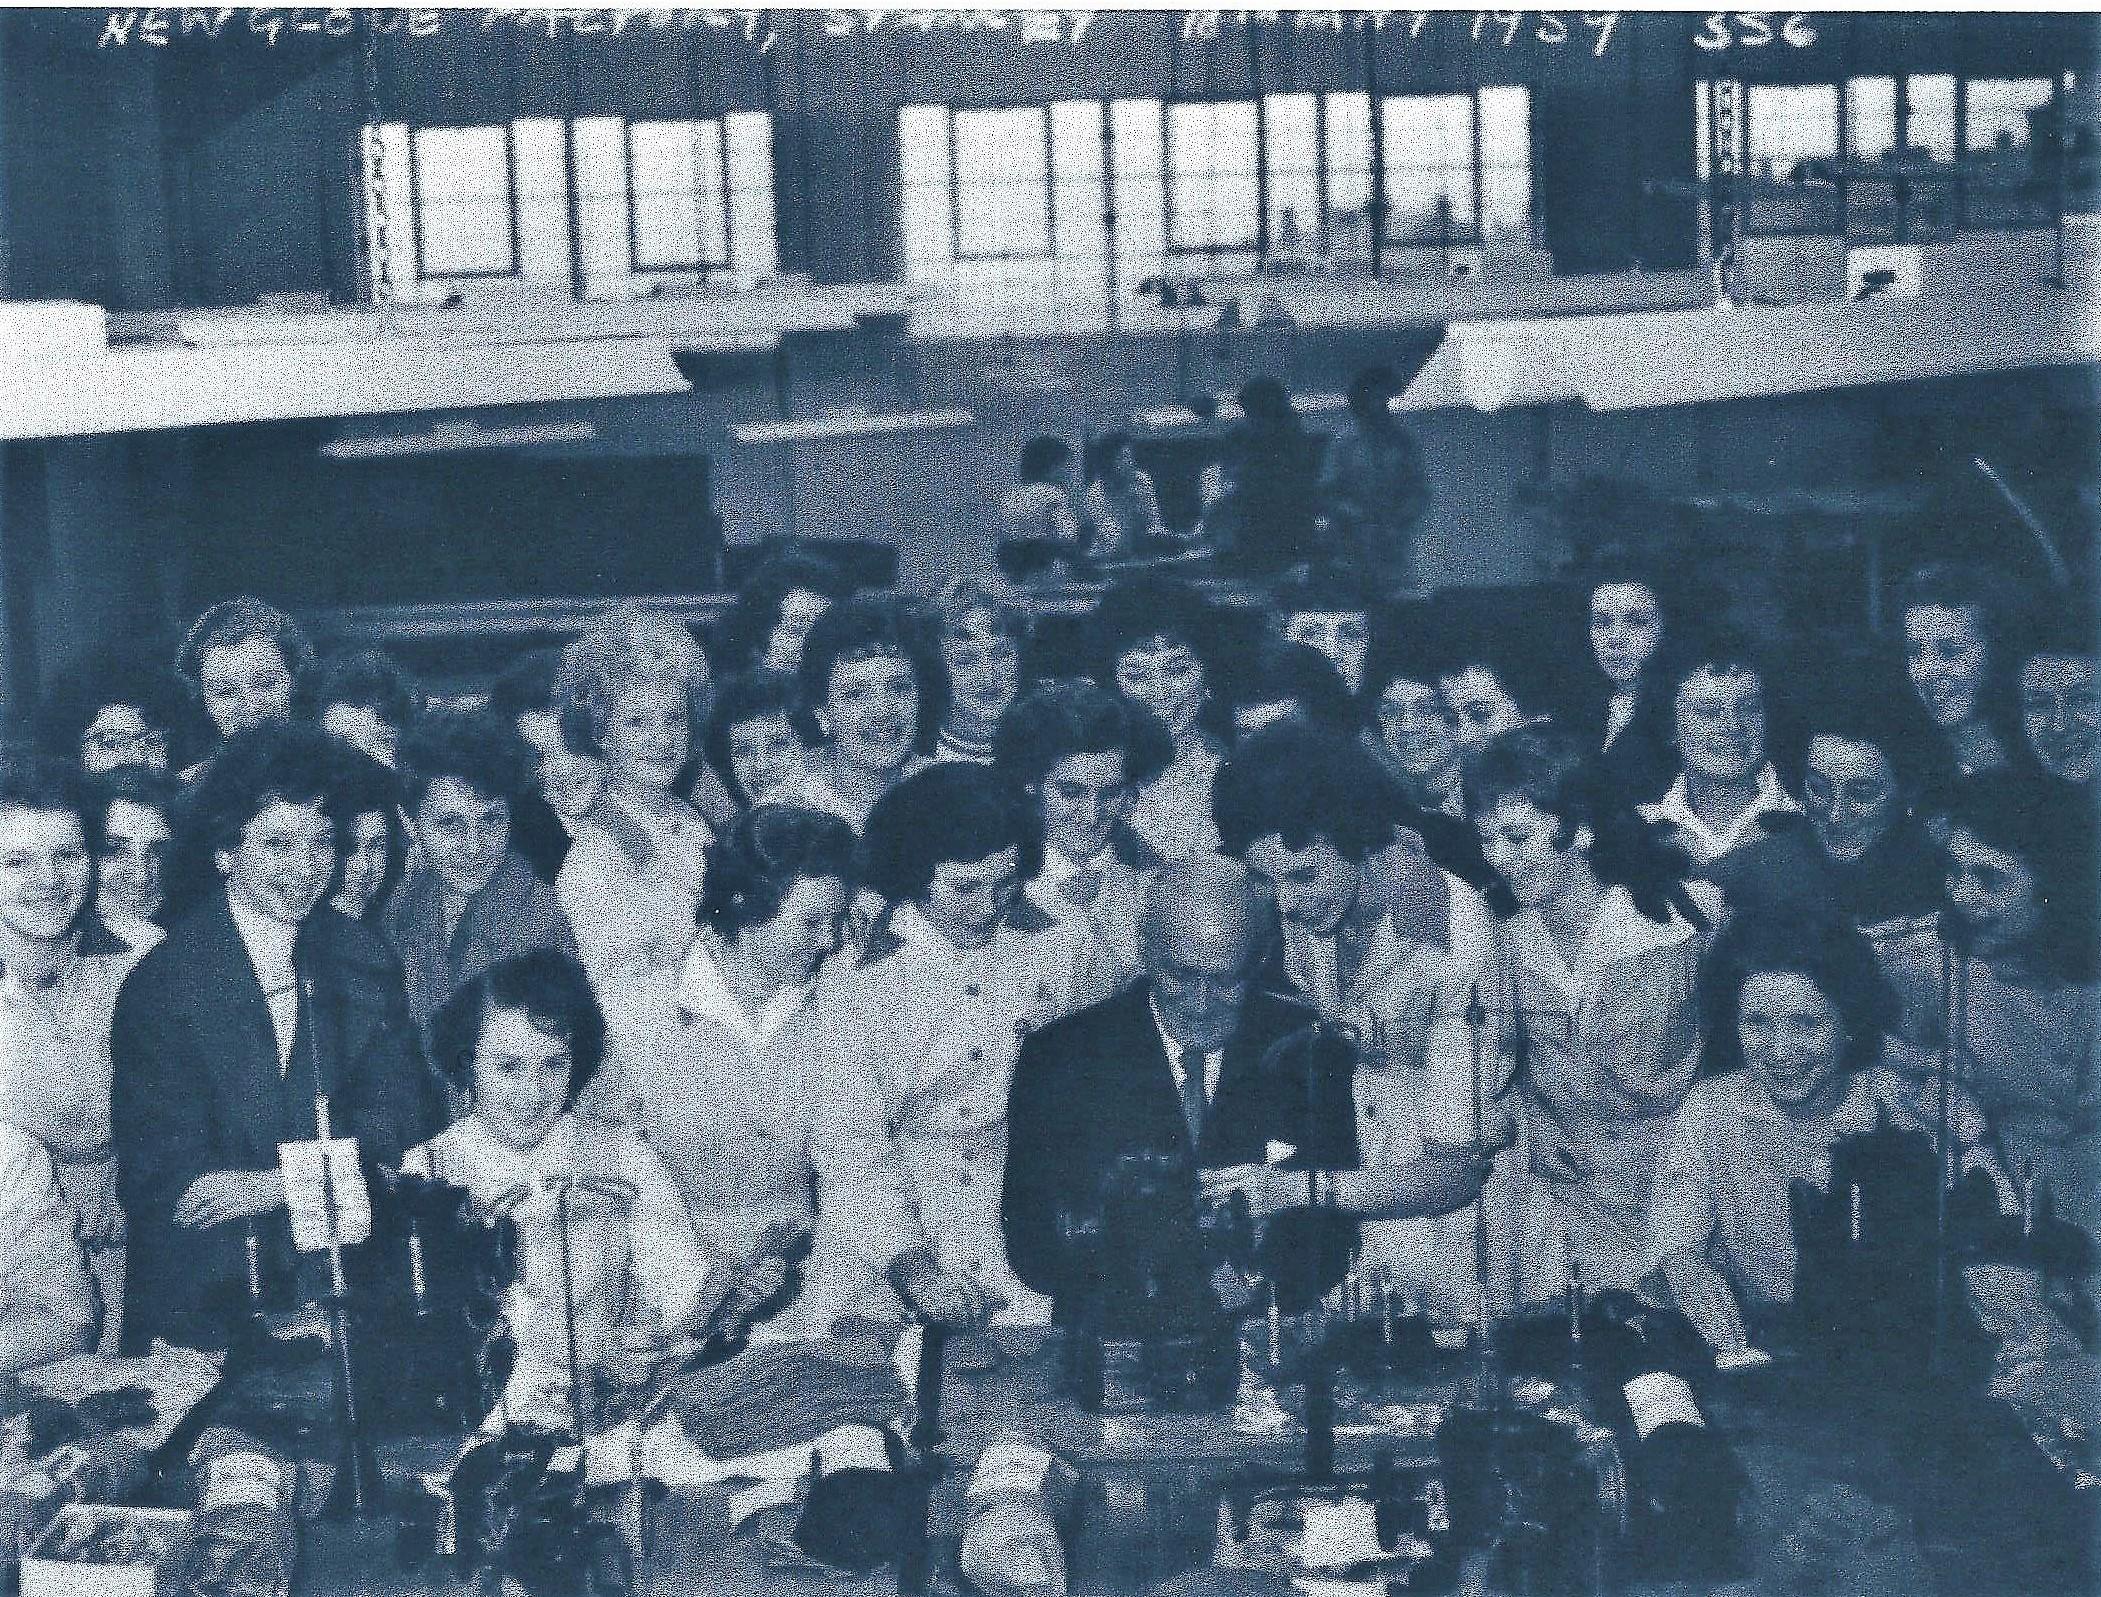 Stanley factory in 1959